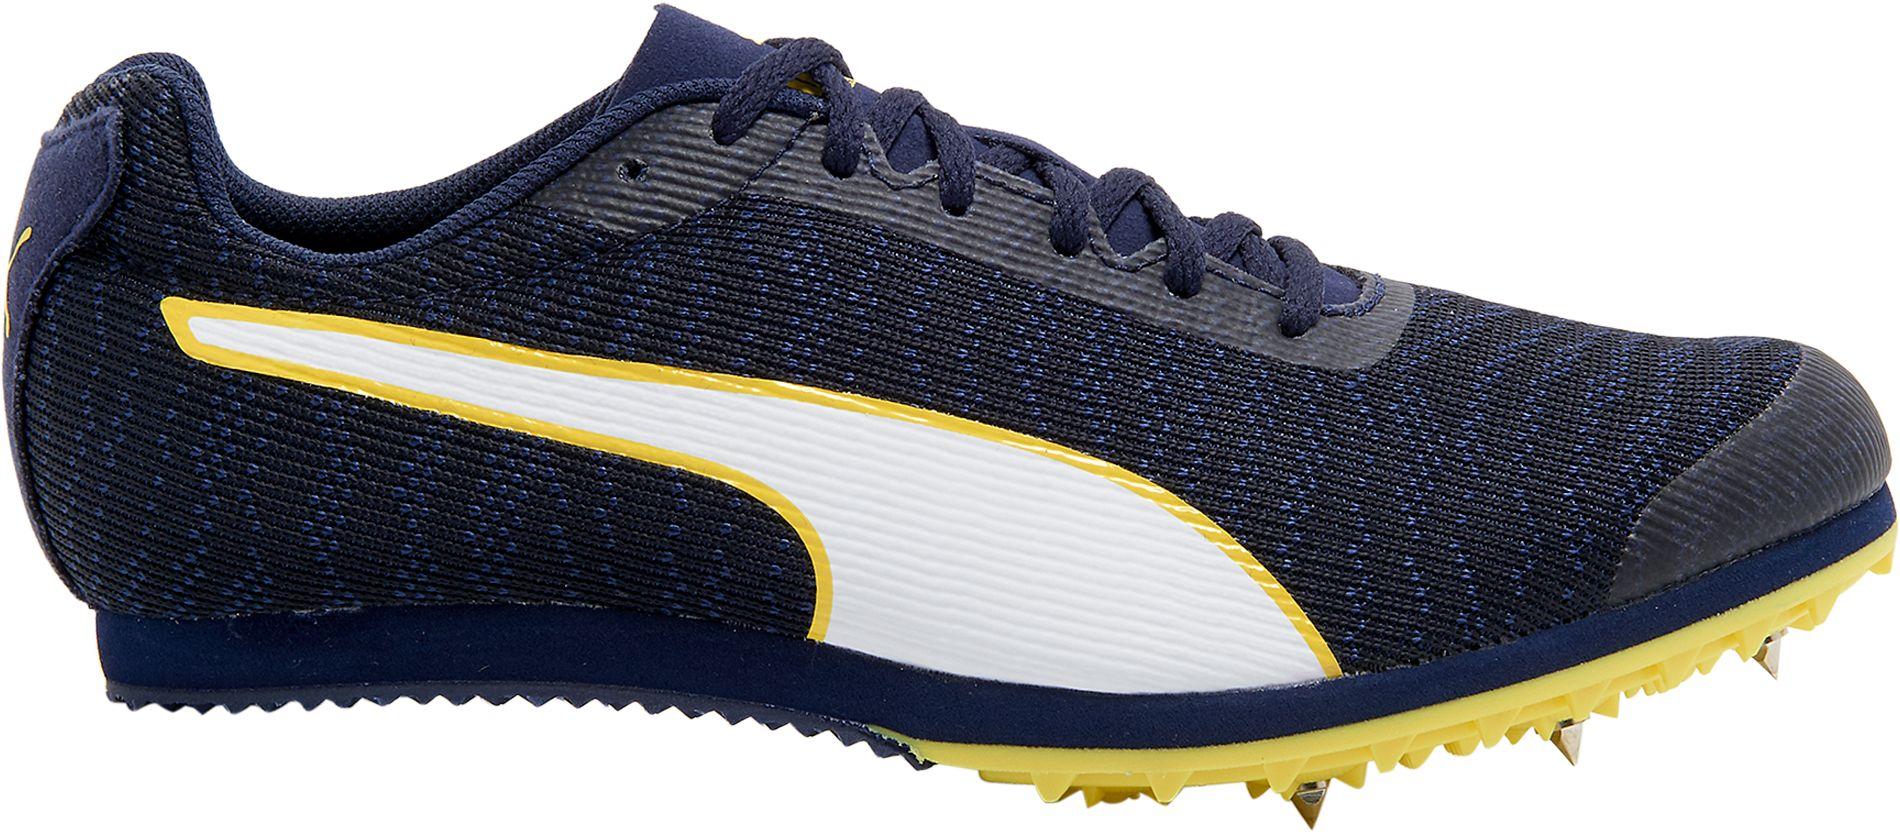 Puma Kids' evoSPEED Star 6 Track and Field Shoes, Boy's ...